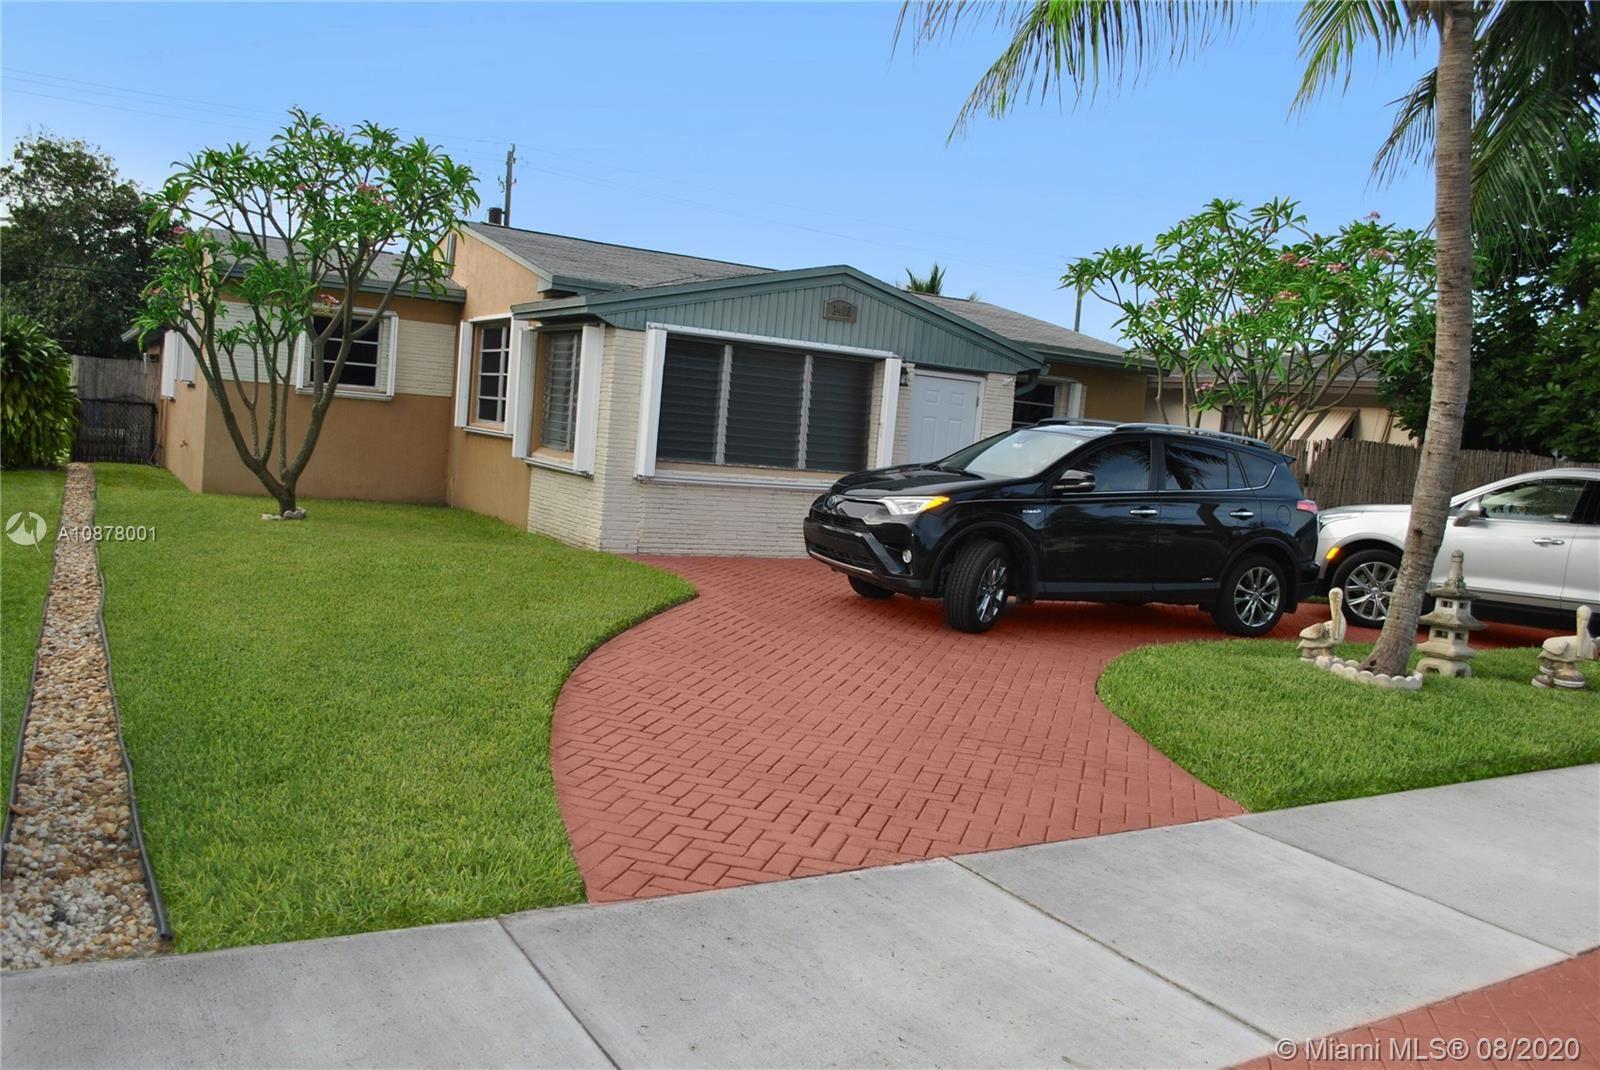 2415 Roosevelt St, Hollywood, FL 33020 - #: A10878001